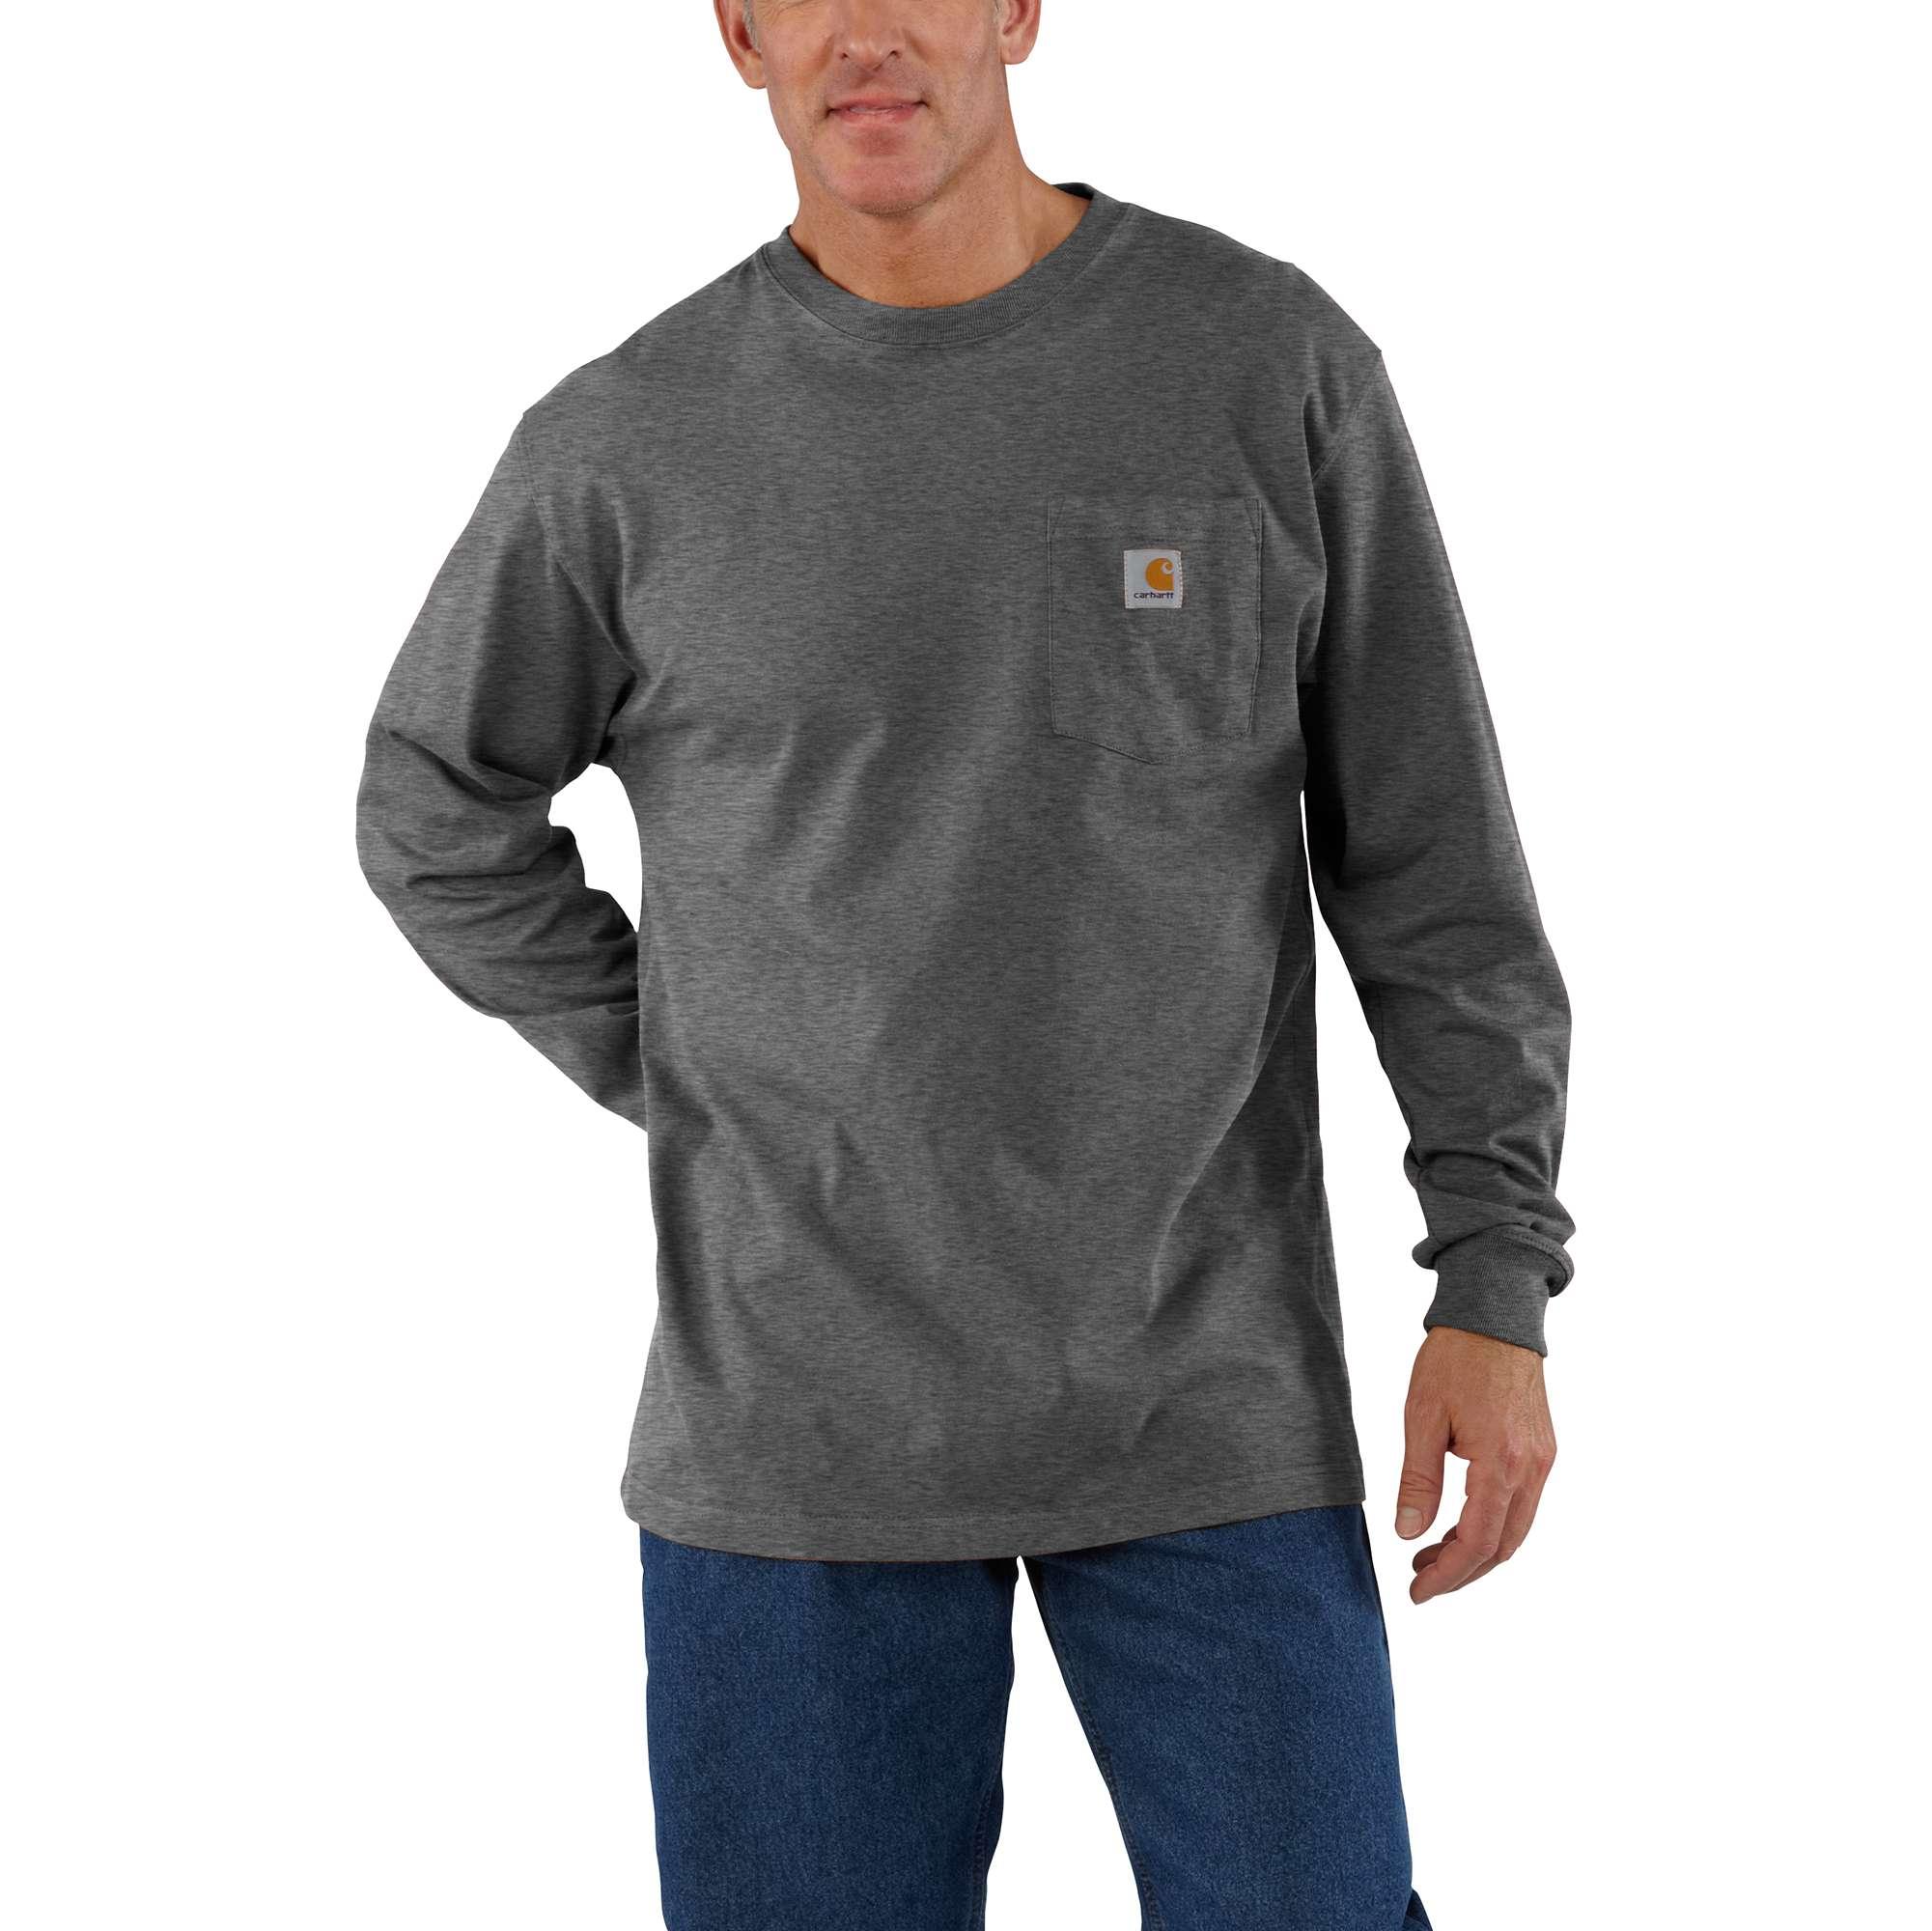 Men's Workwear Long Sleeve Pocket T-Shirt, Dark Gray,Pewter,Slate, swatch